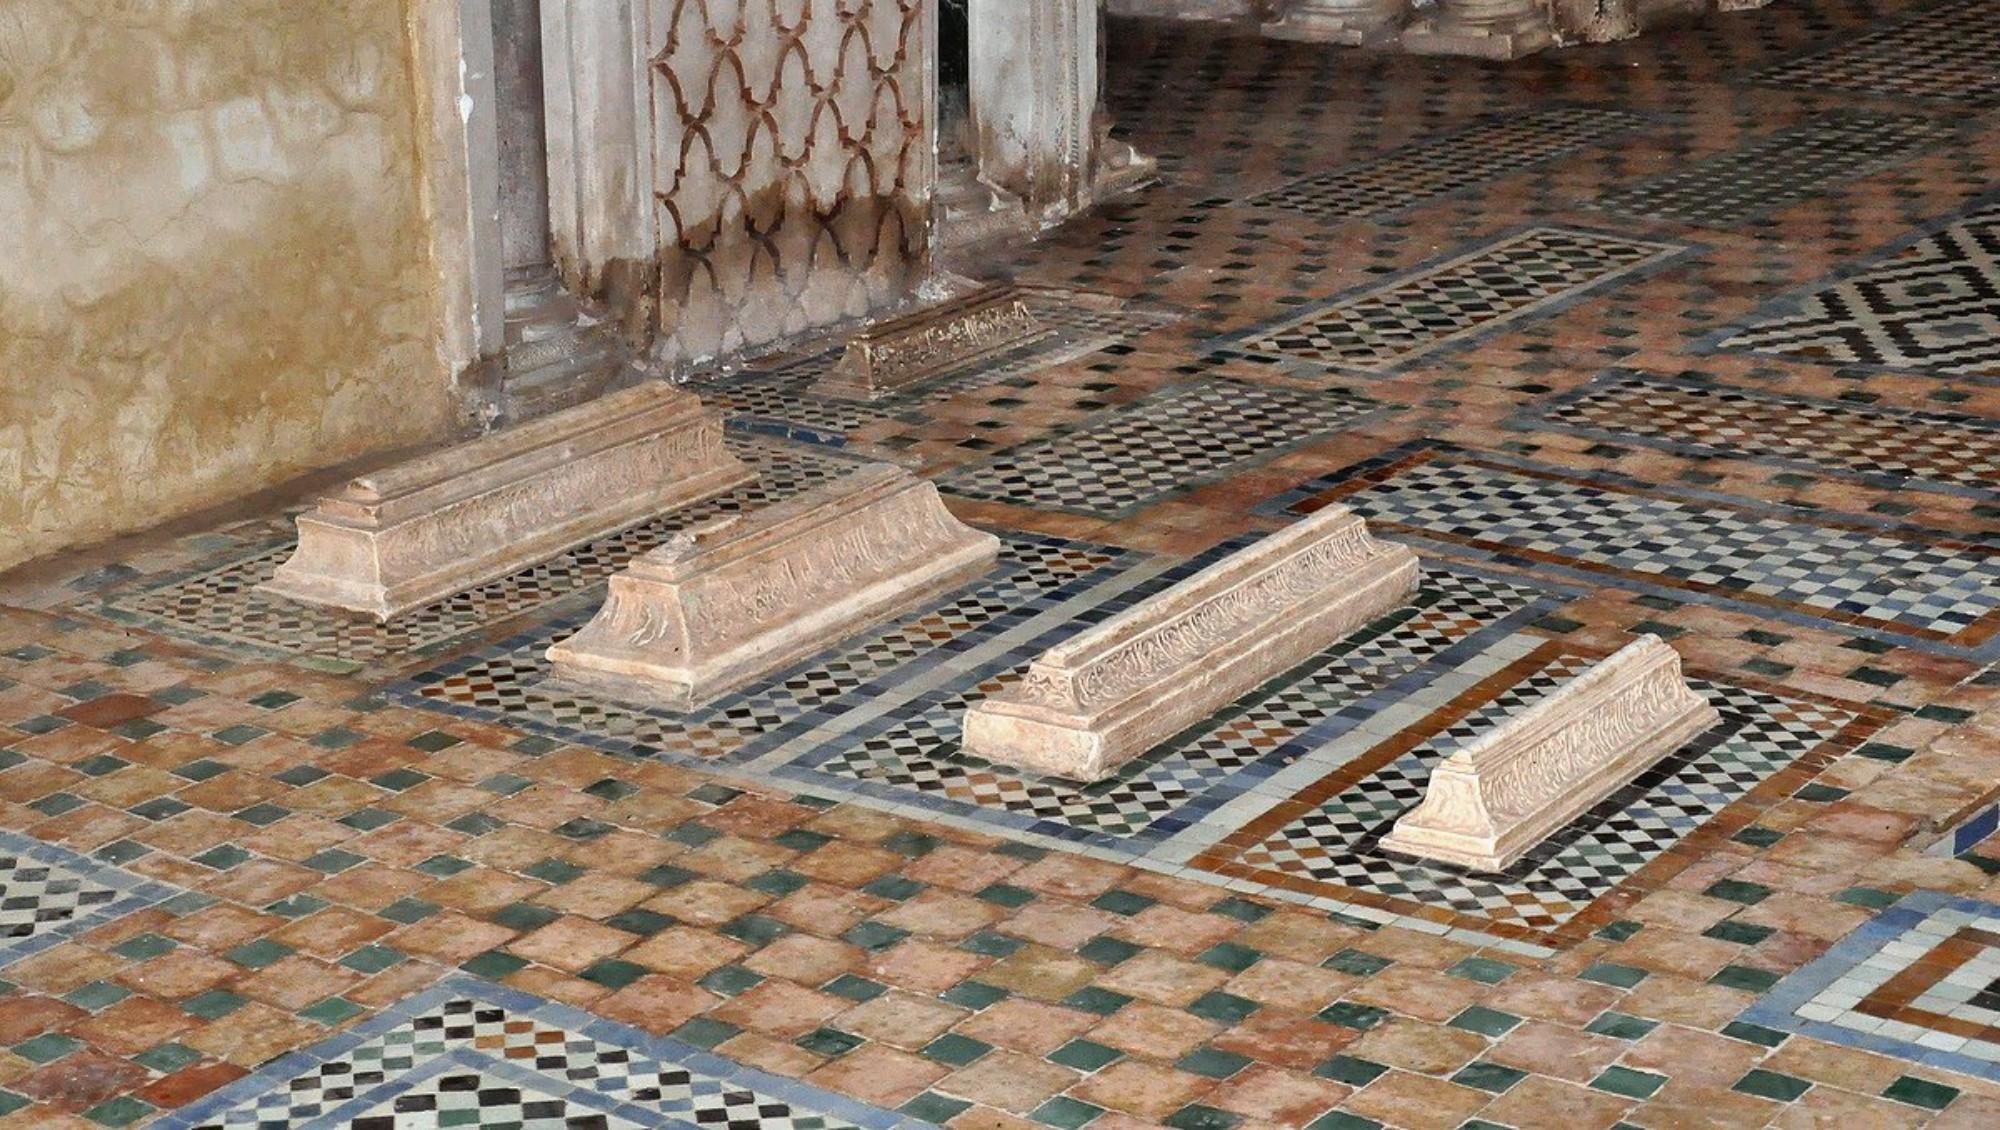 qué ver en Marrakech tumbas saadies